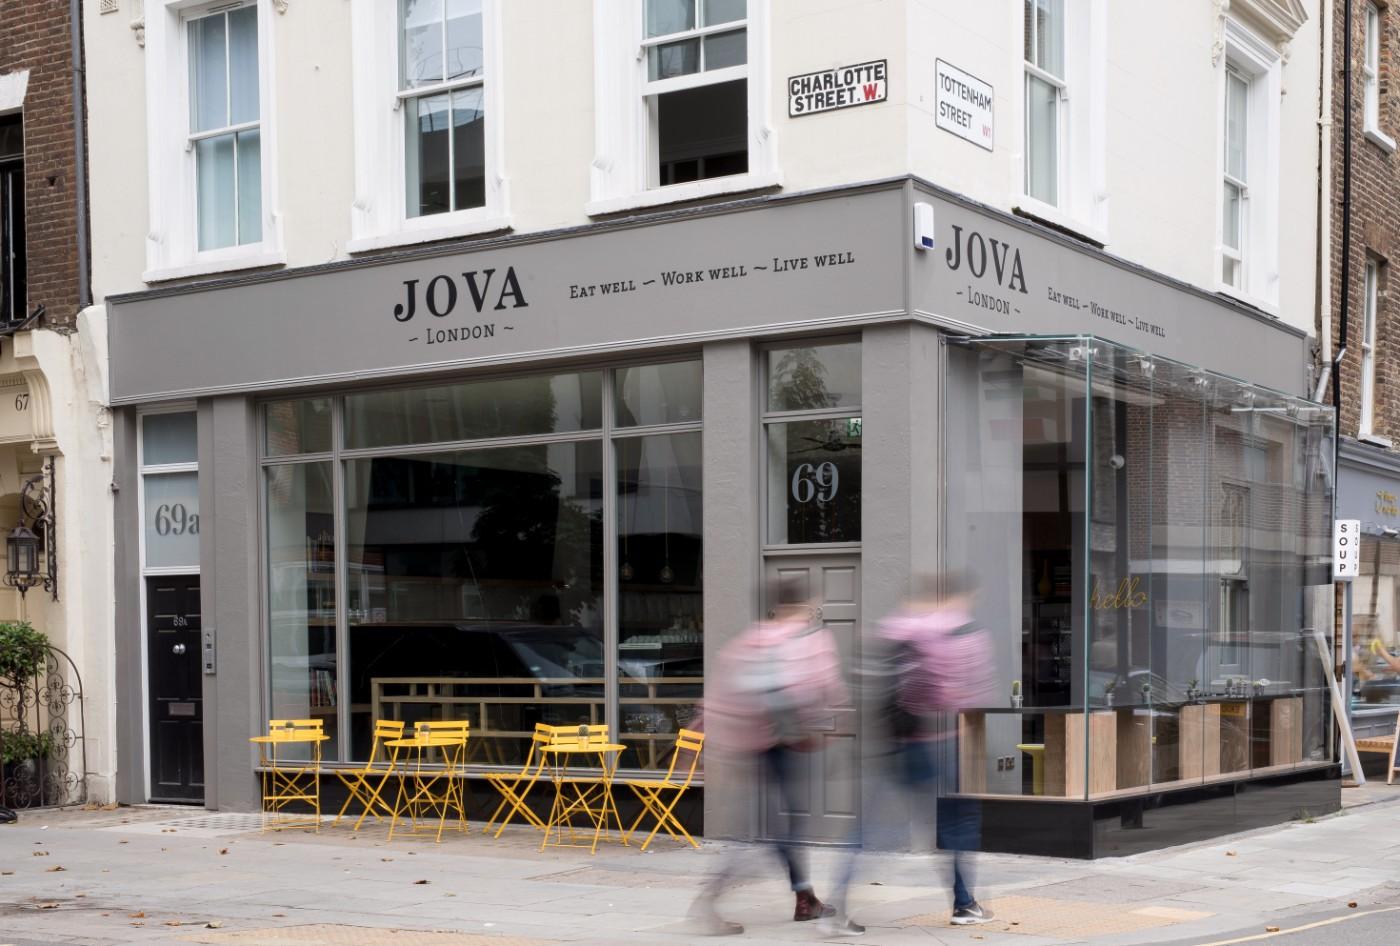 JOVA London: Lifestyle Café and Workspace